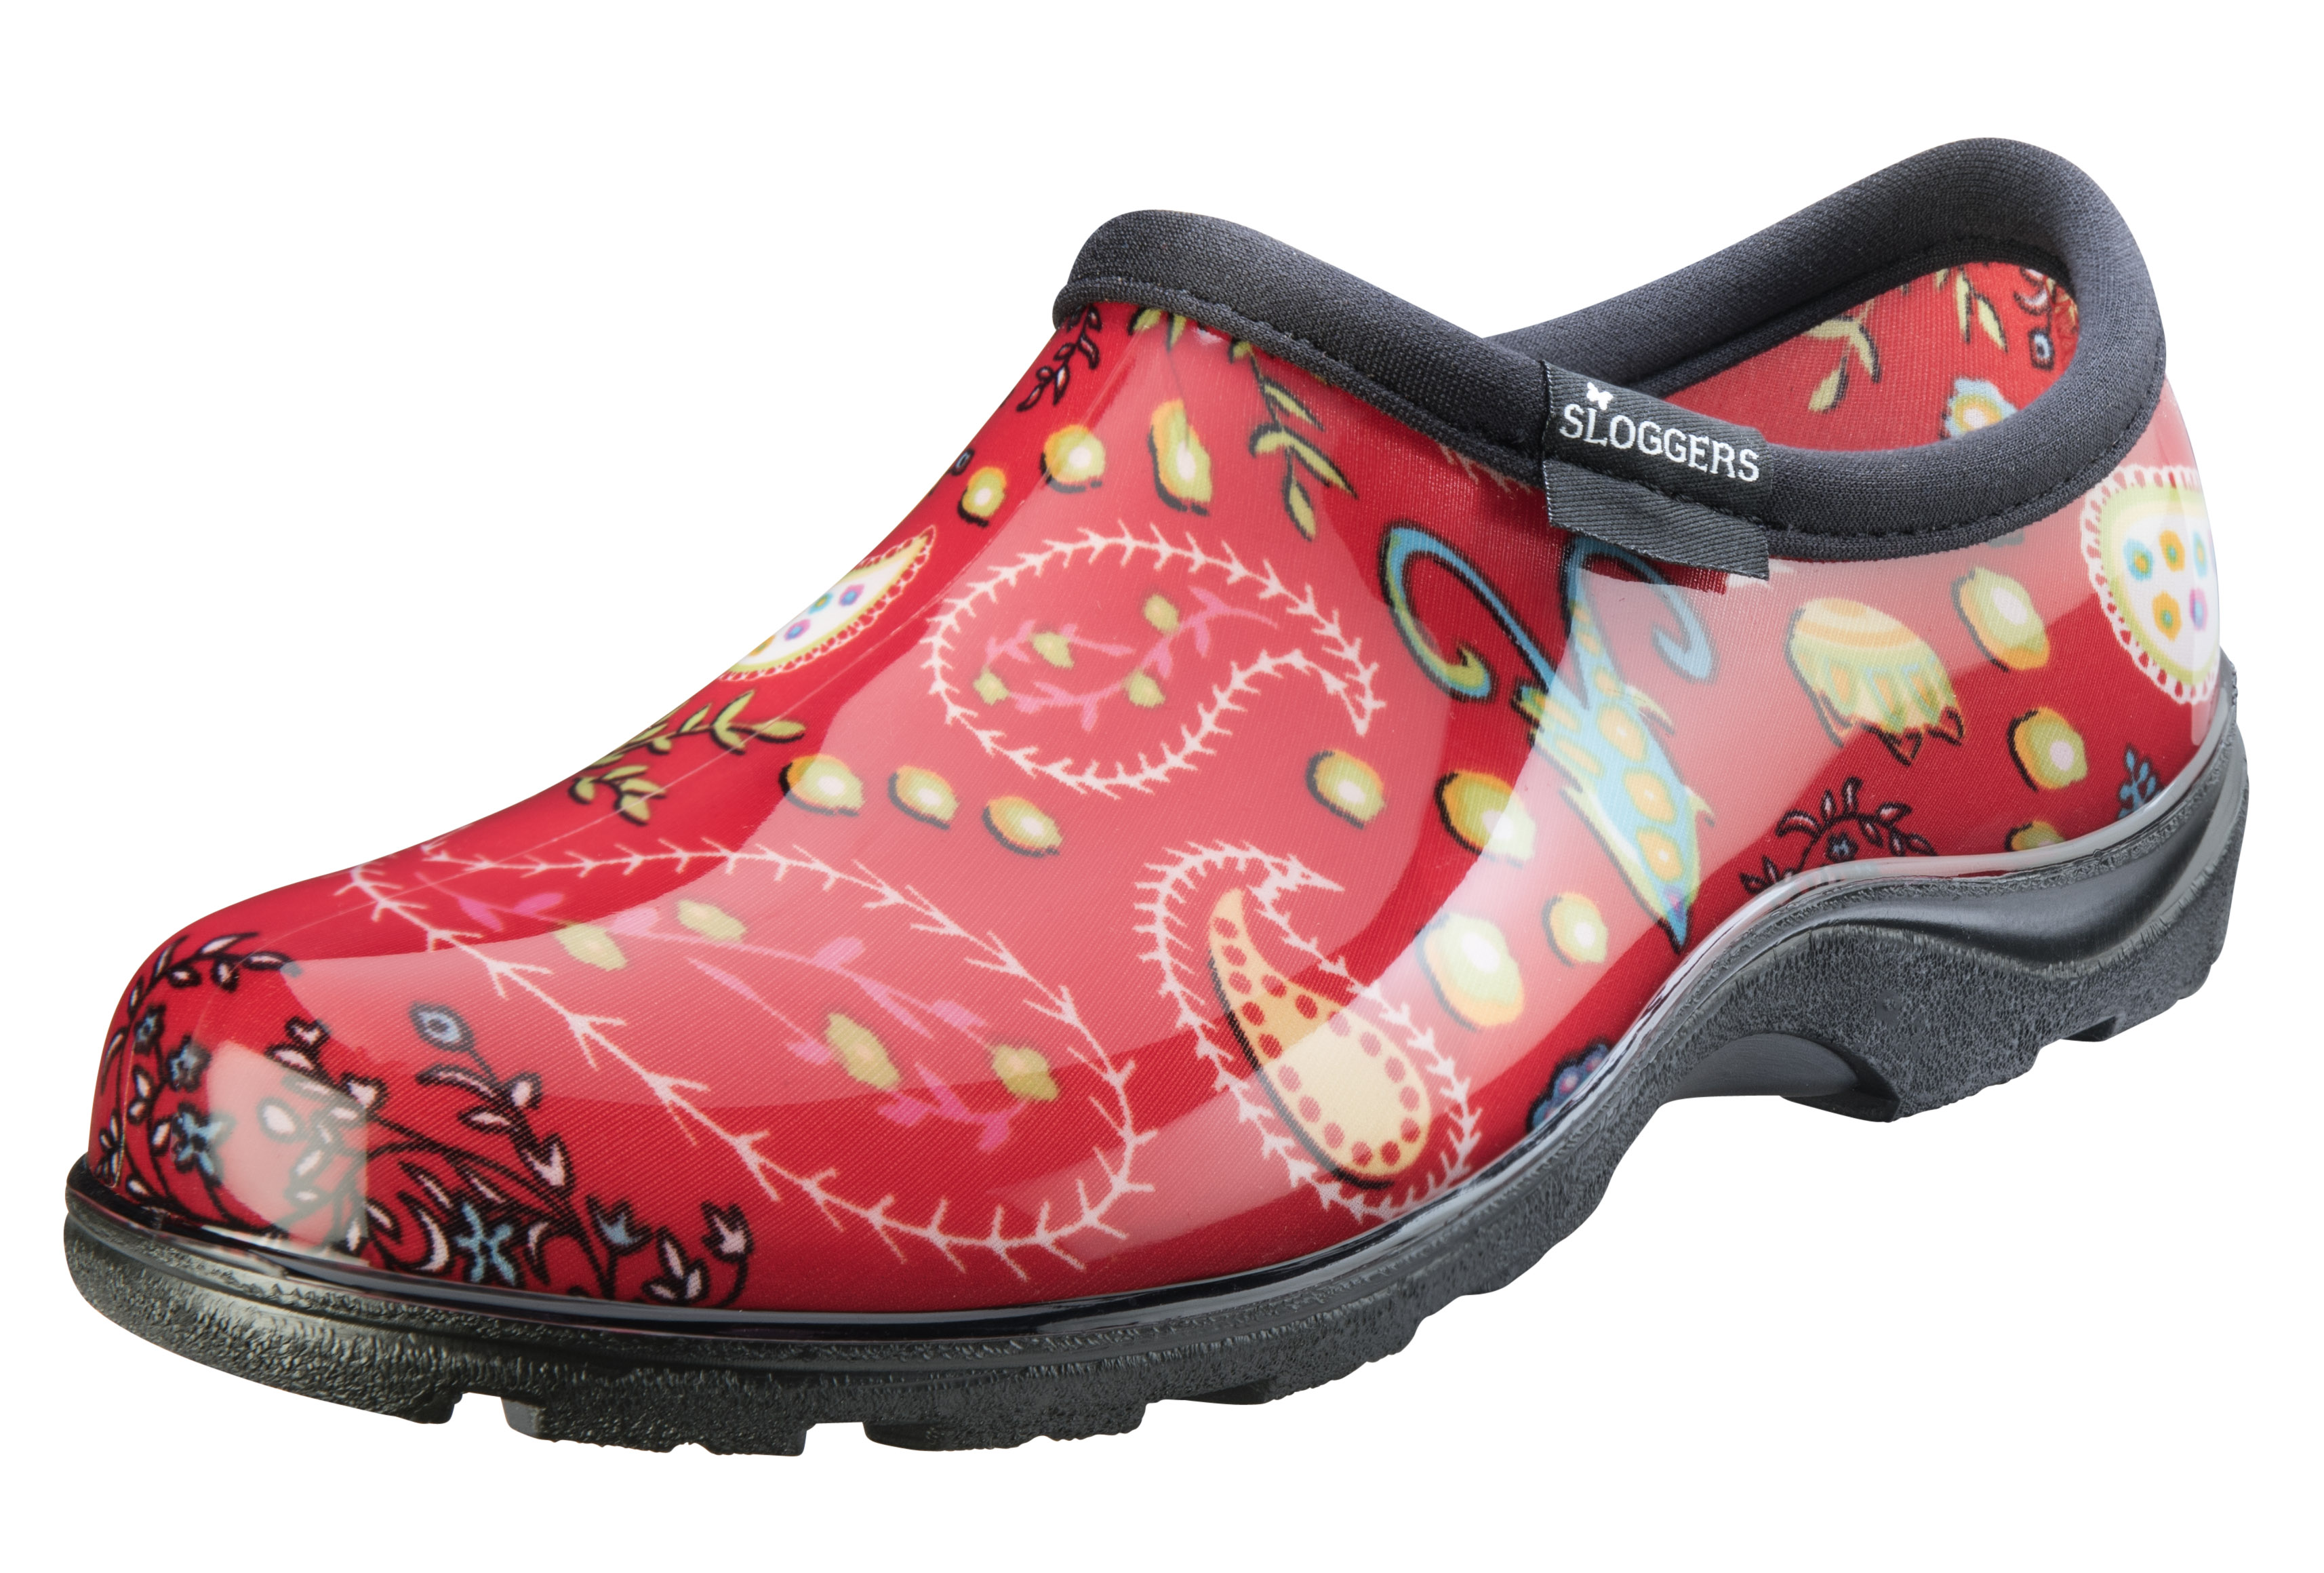 Sloggers Waterproof Rain Shoes